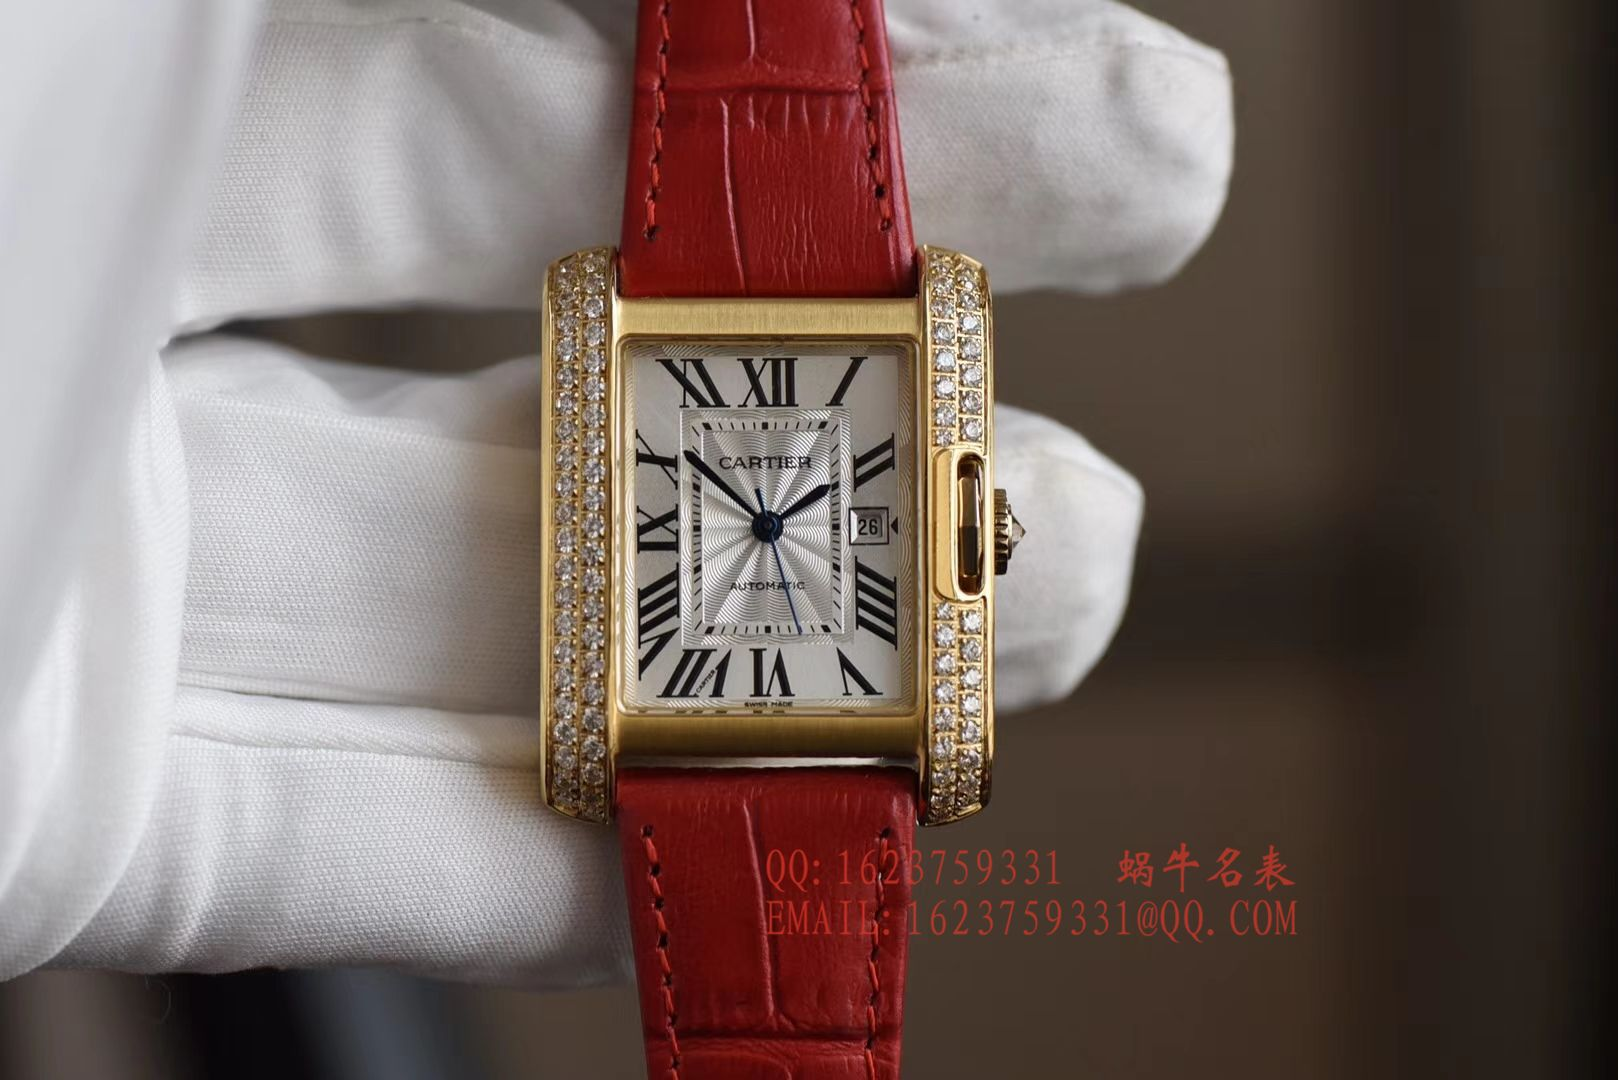 【K11厂顶级复刻手表】卡地亚坦克 TANK ANGLAISE系列WT100017女士腕表 / KAH141